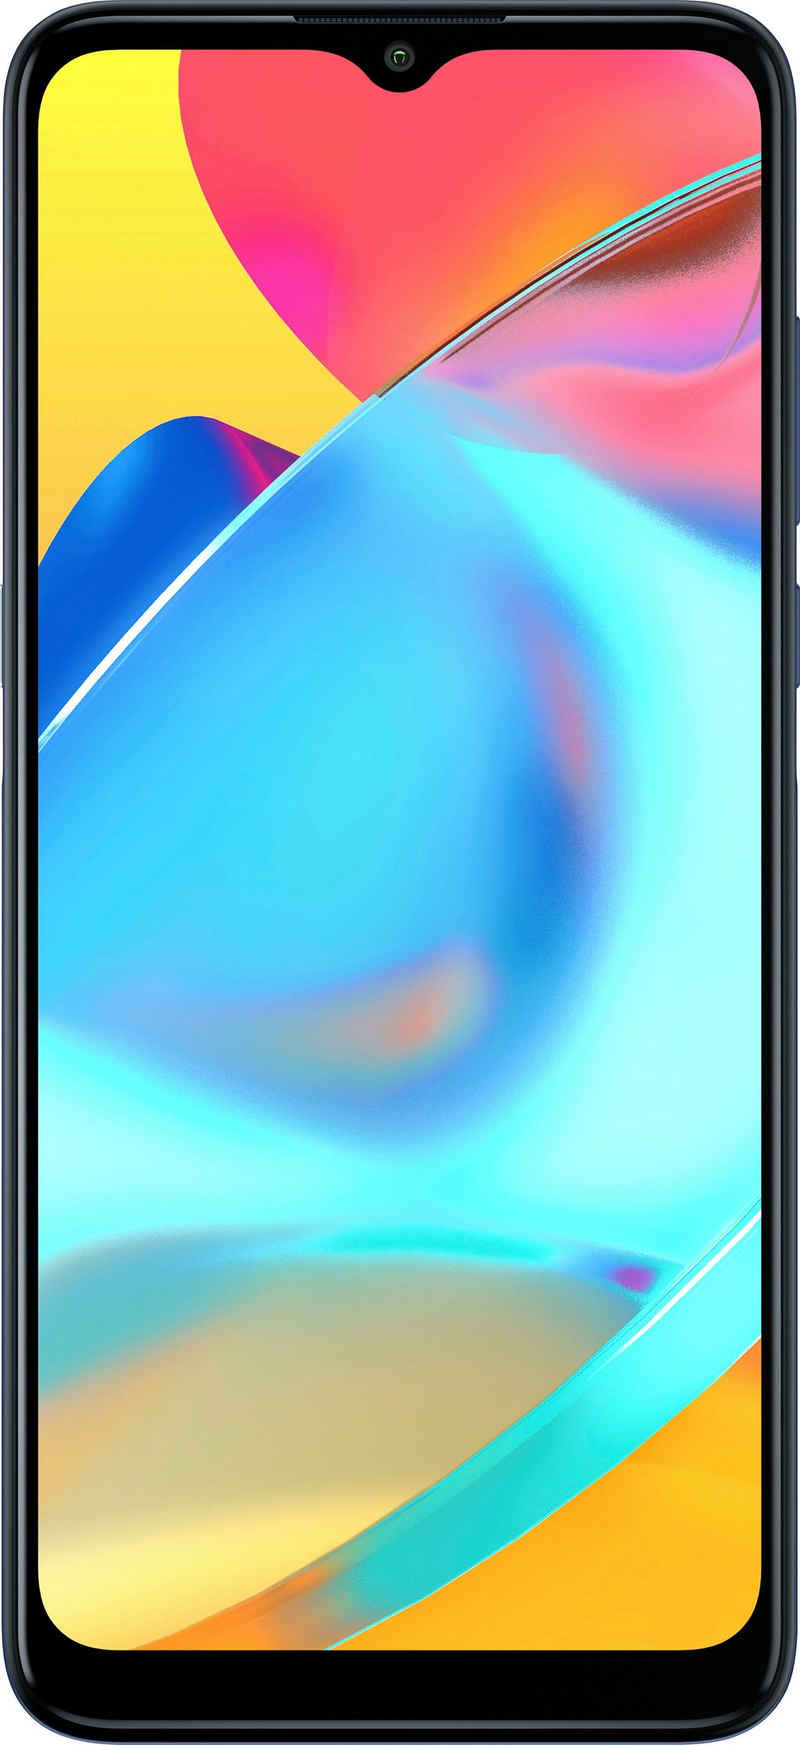 Alcatel ALCATEL 3L (2021) Smartphone (16,56 cm/6,52 Zoll, 64 GB Speicherplatz, 48 MP Kamera)